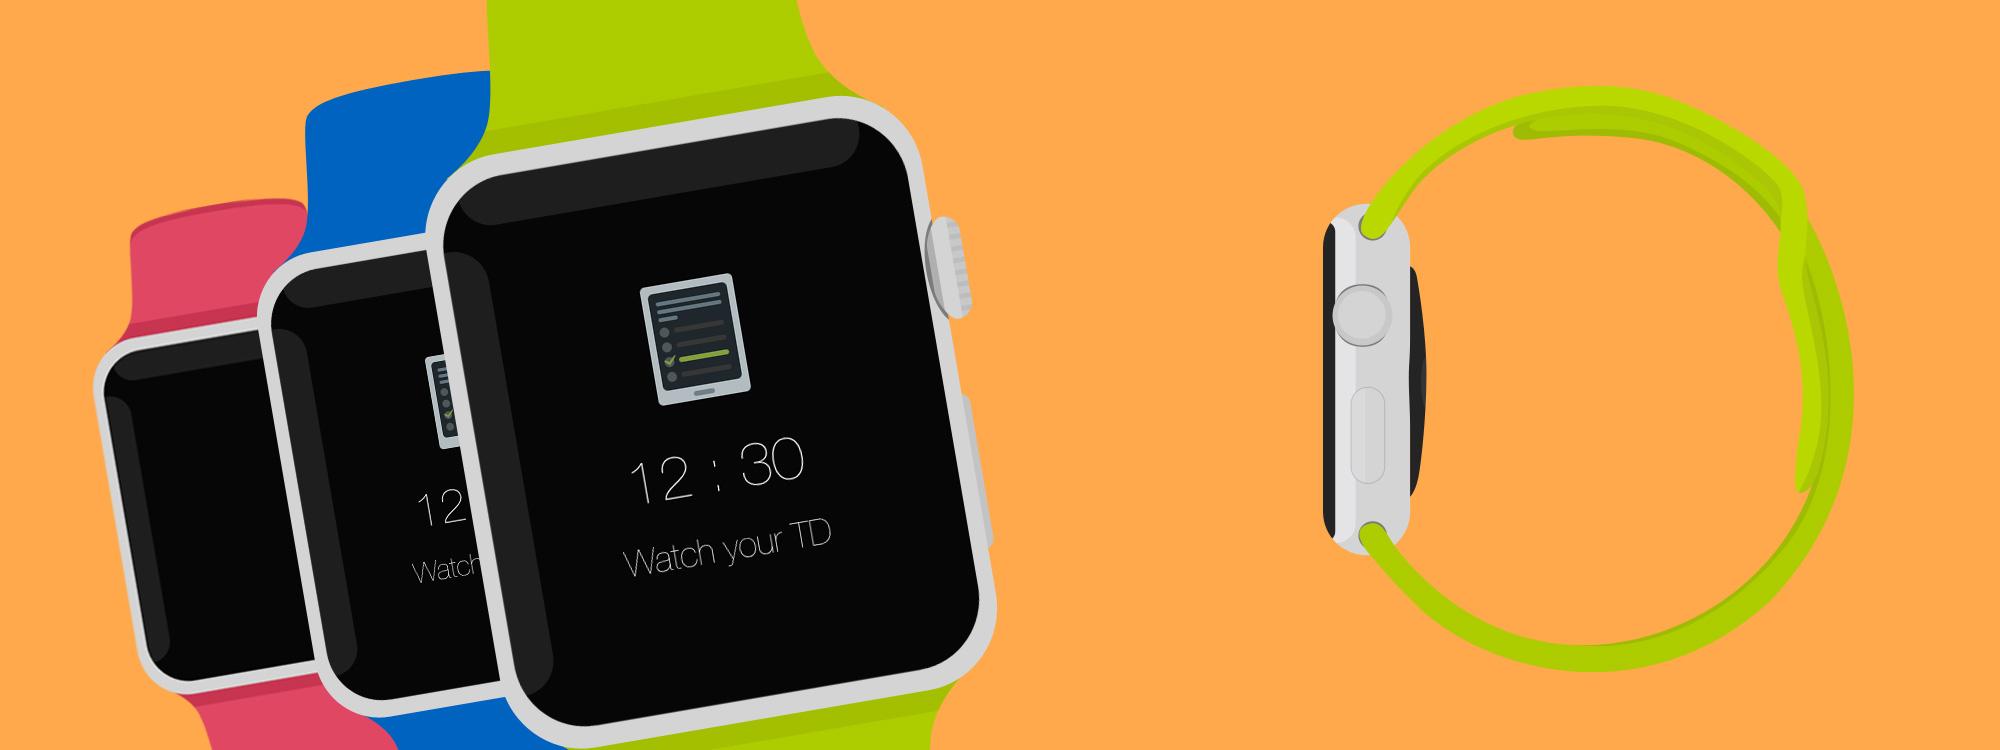 Apple Watch Series 3セルラーモデルで何が変わる?新機能を紹介